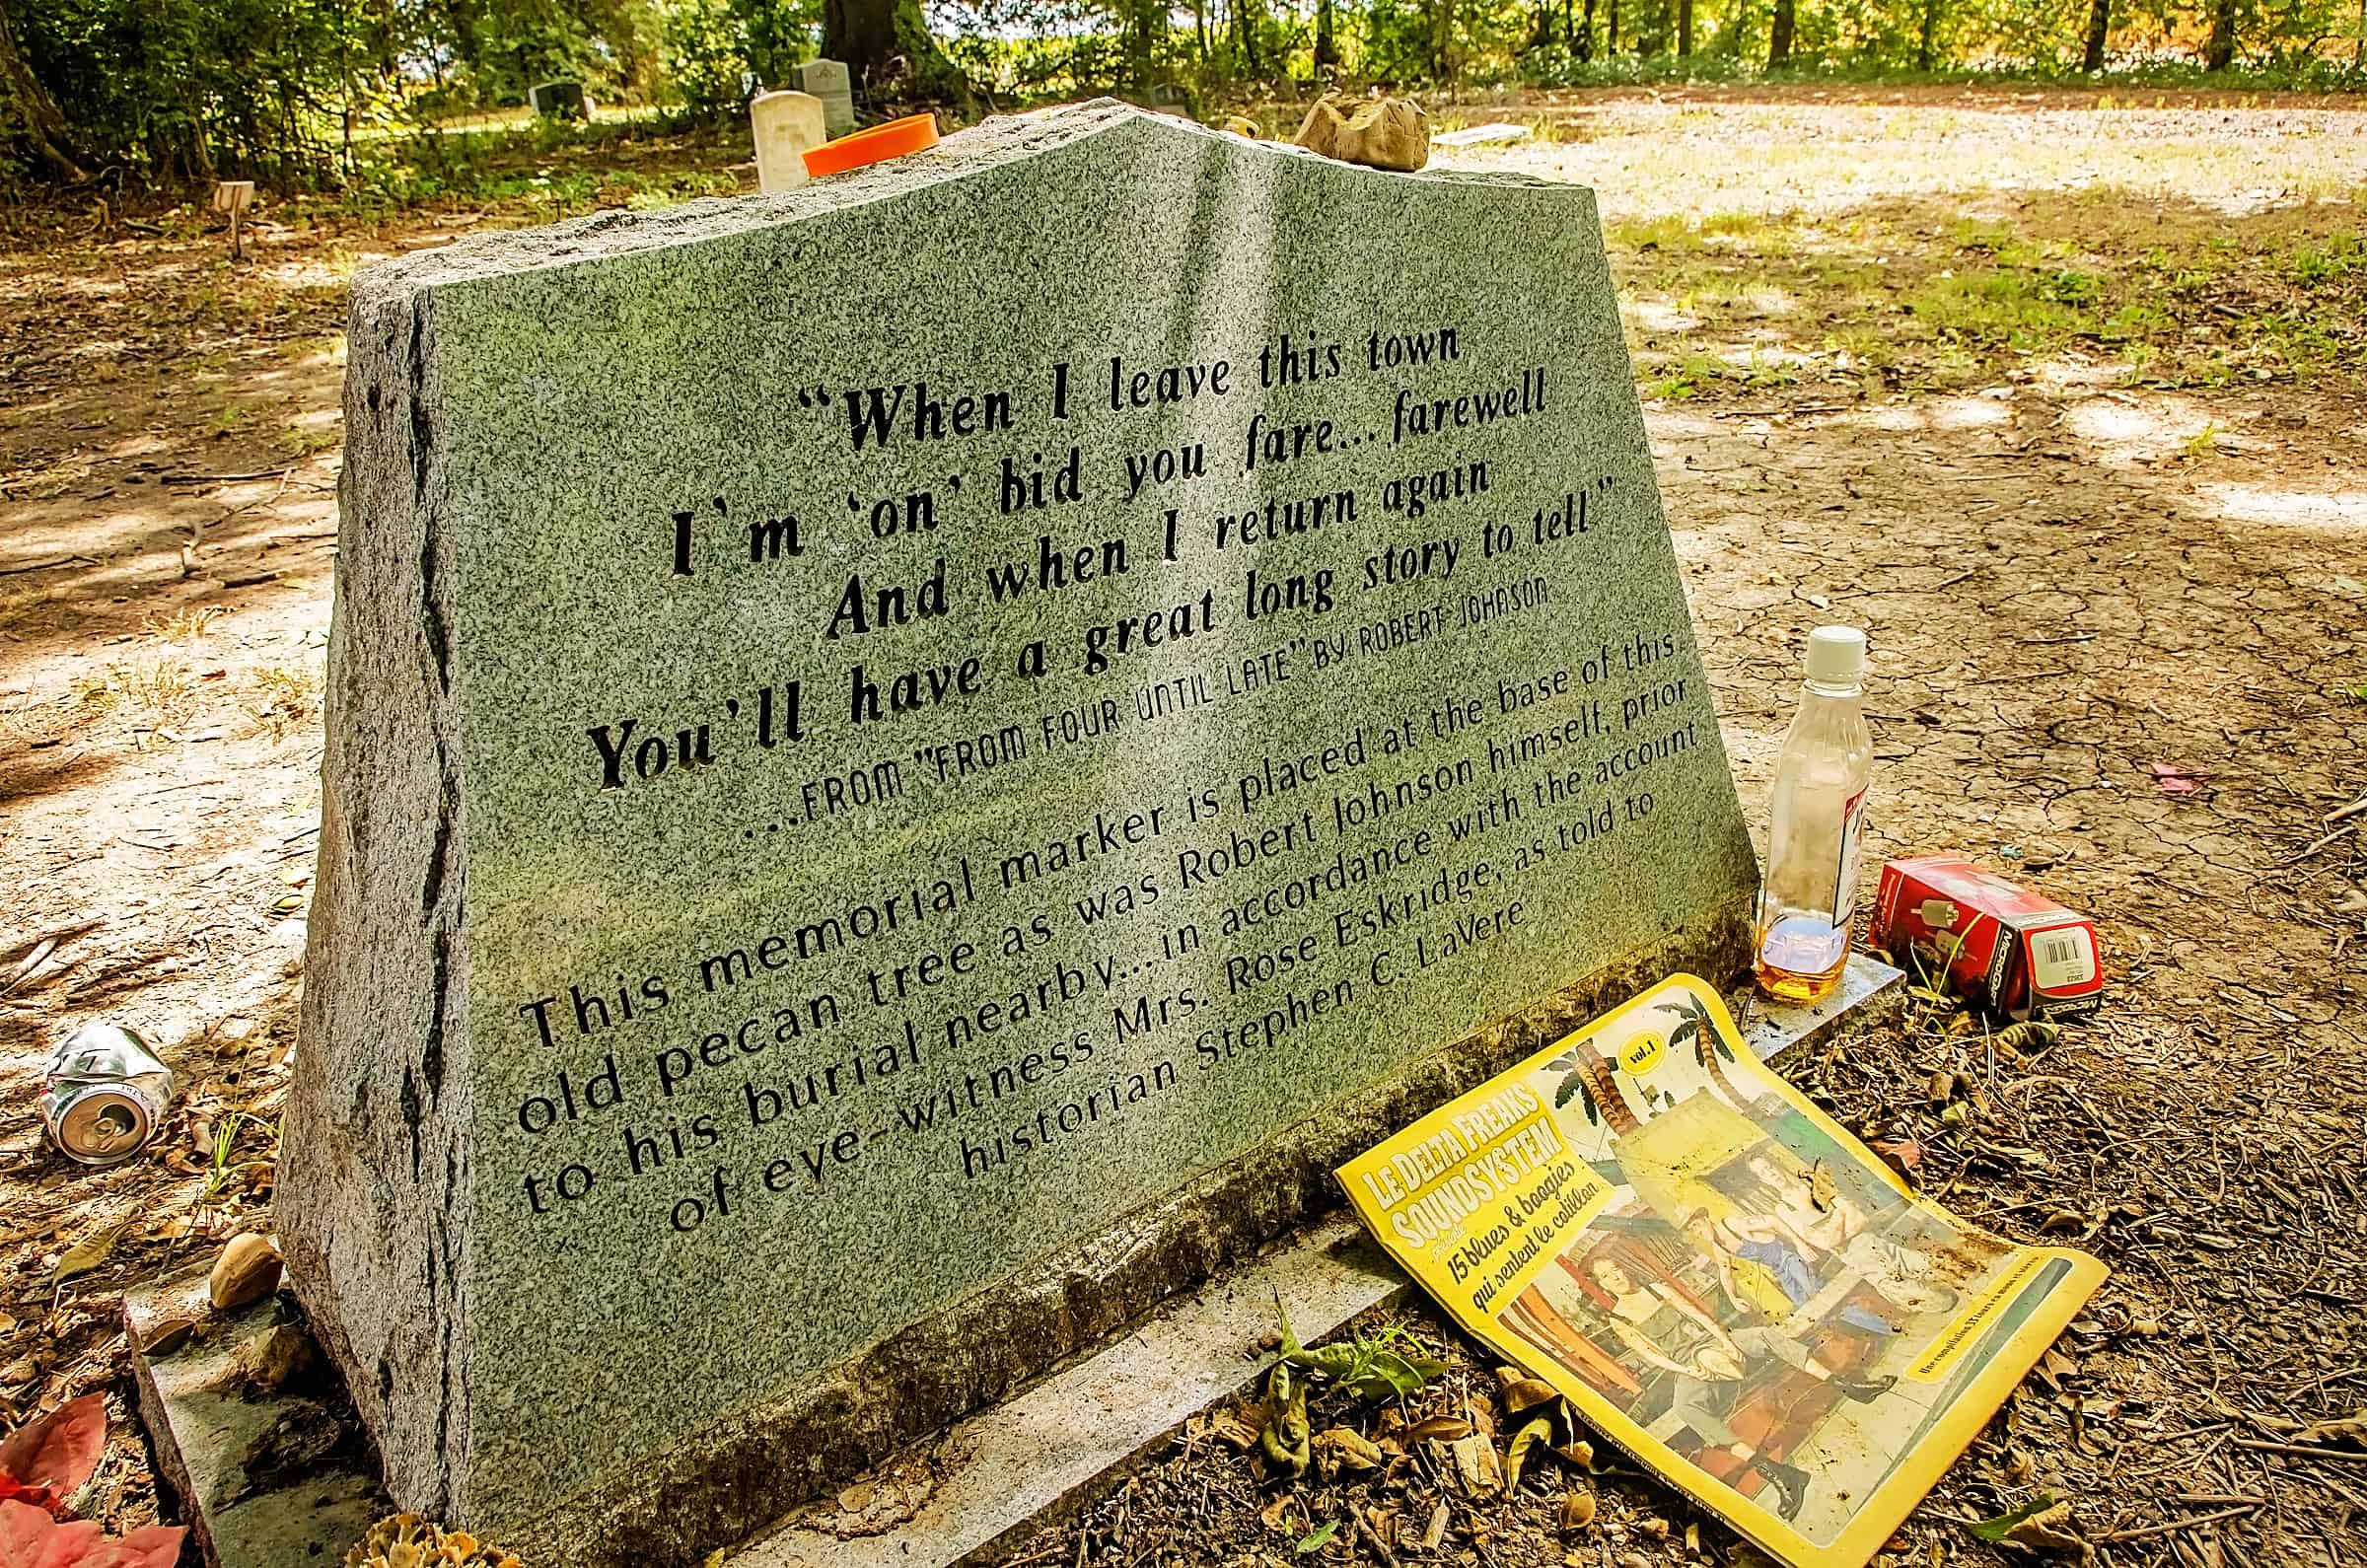 Back side of bluesman Robert Johnson's grave in Greenwood, Mississippi